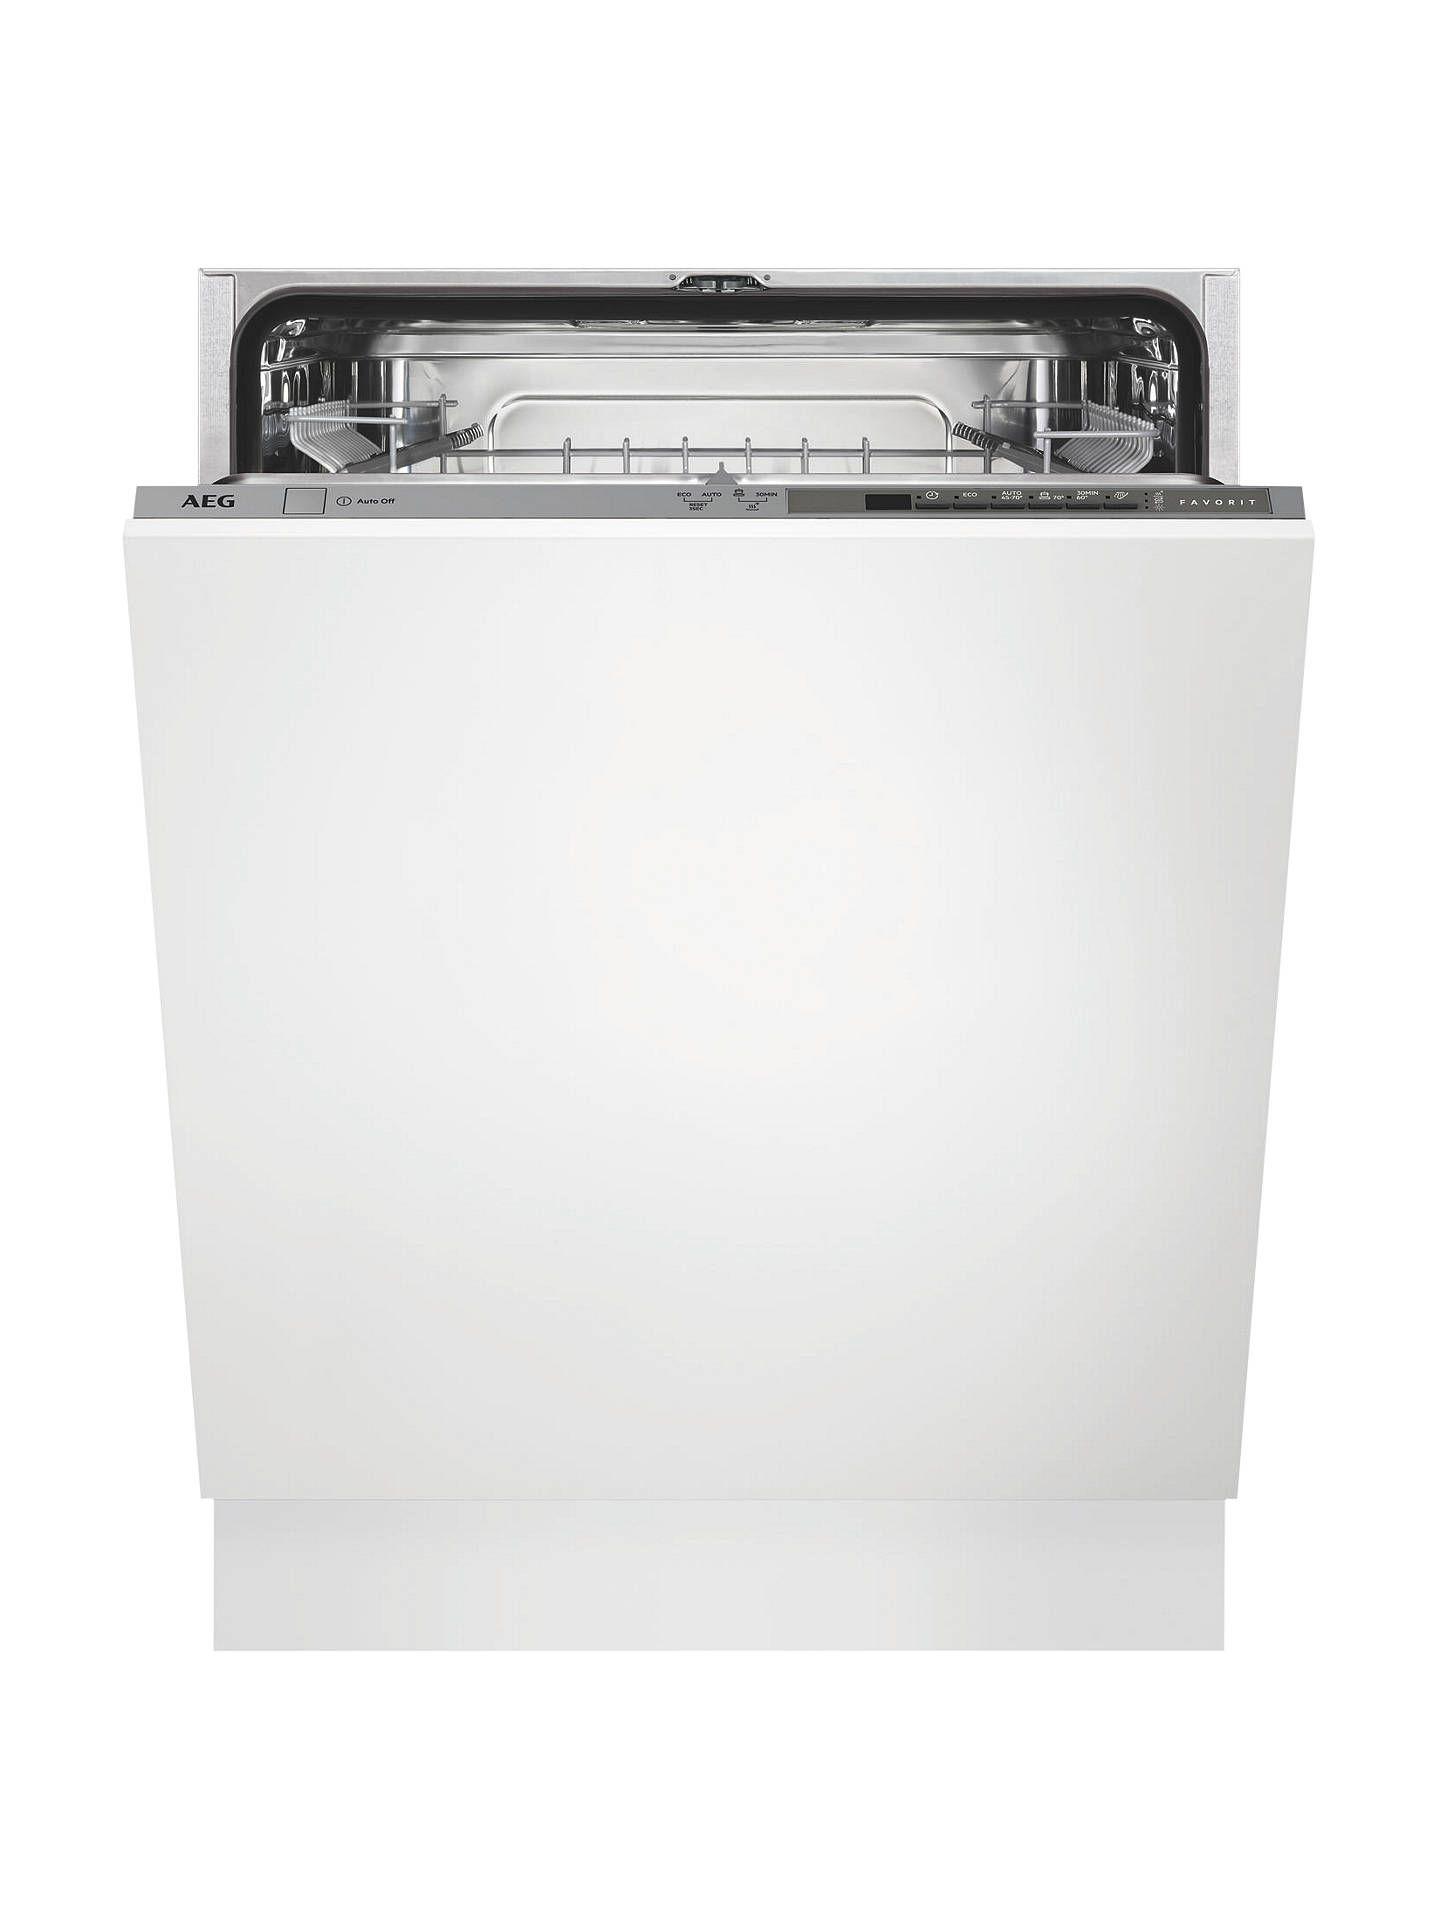 AEG FSB41600Z Integrated Dishwasher, Stainless Steel